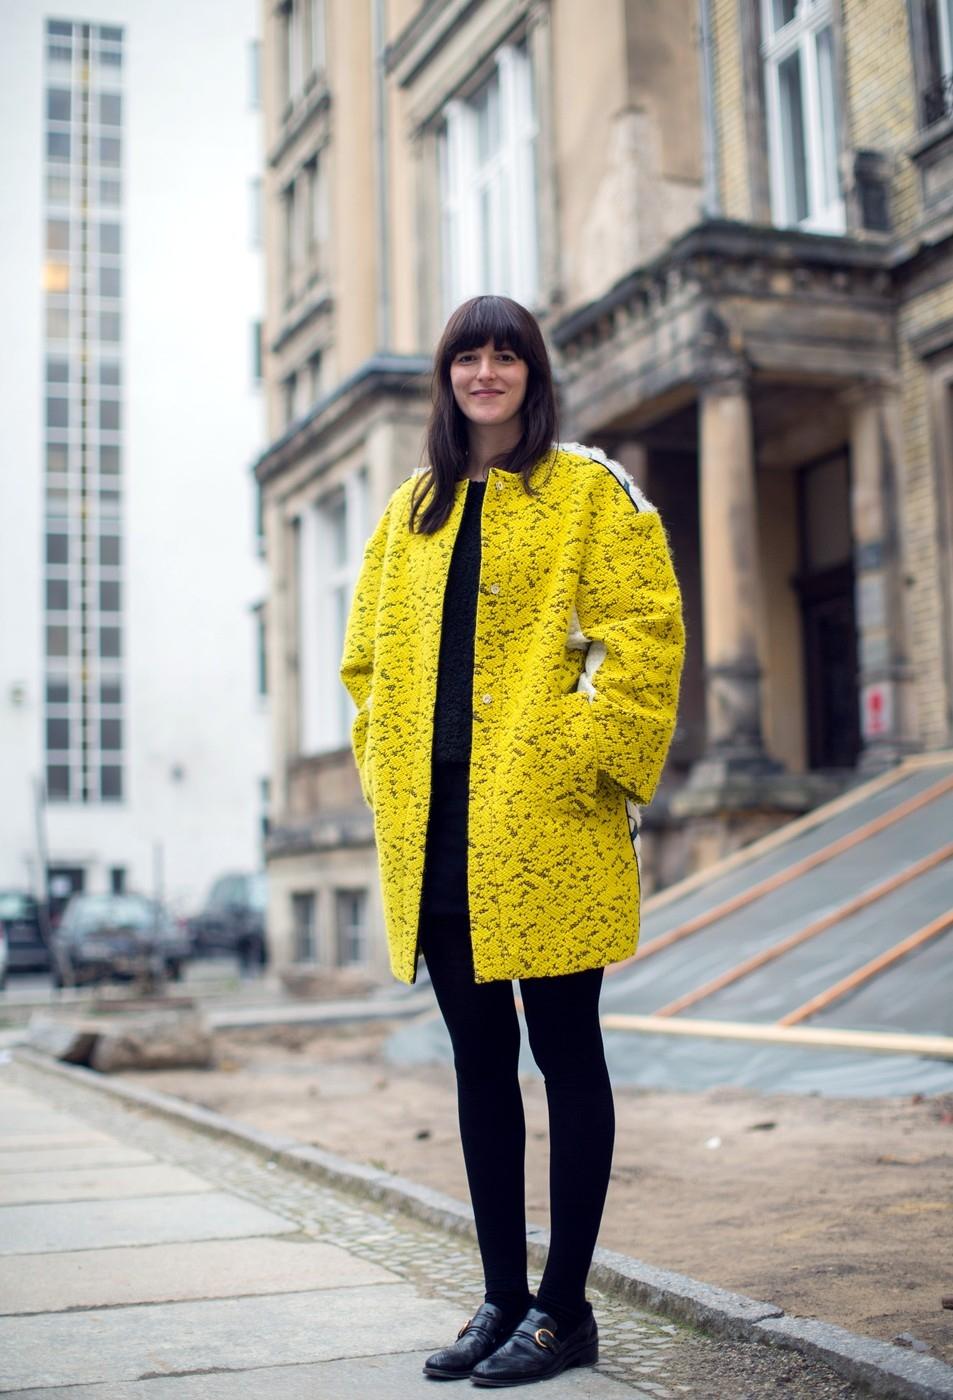 EXCLUSIVE Mercedes Benz Fashion Week Berlin Autumn/Winter 2014 - Streetstyle